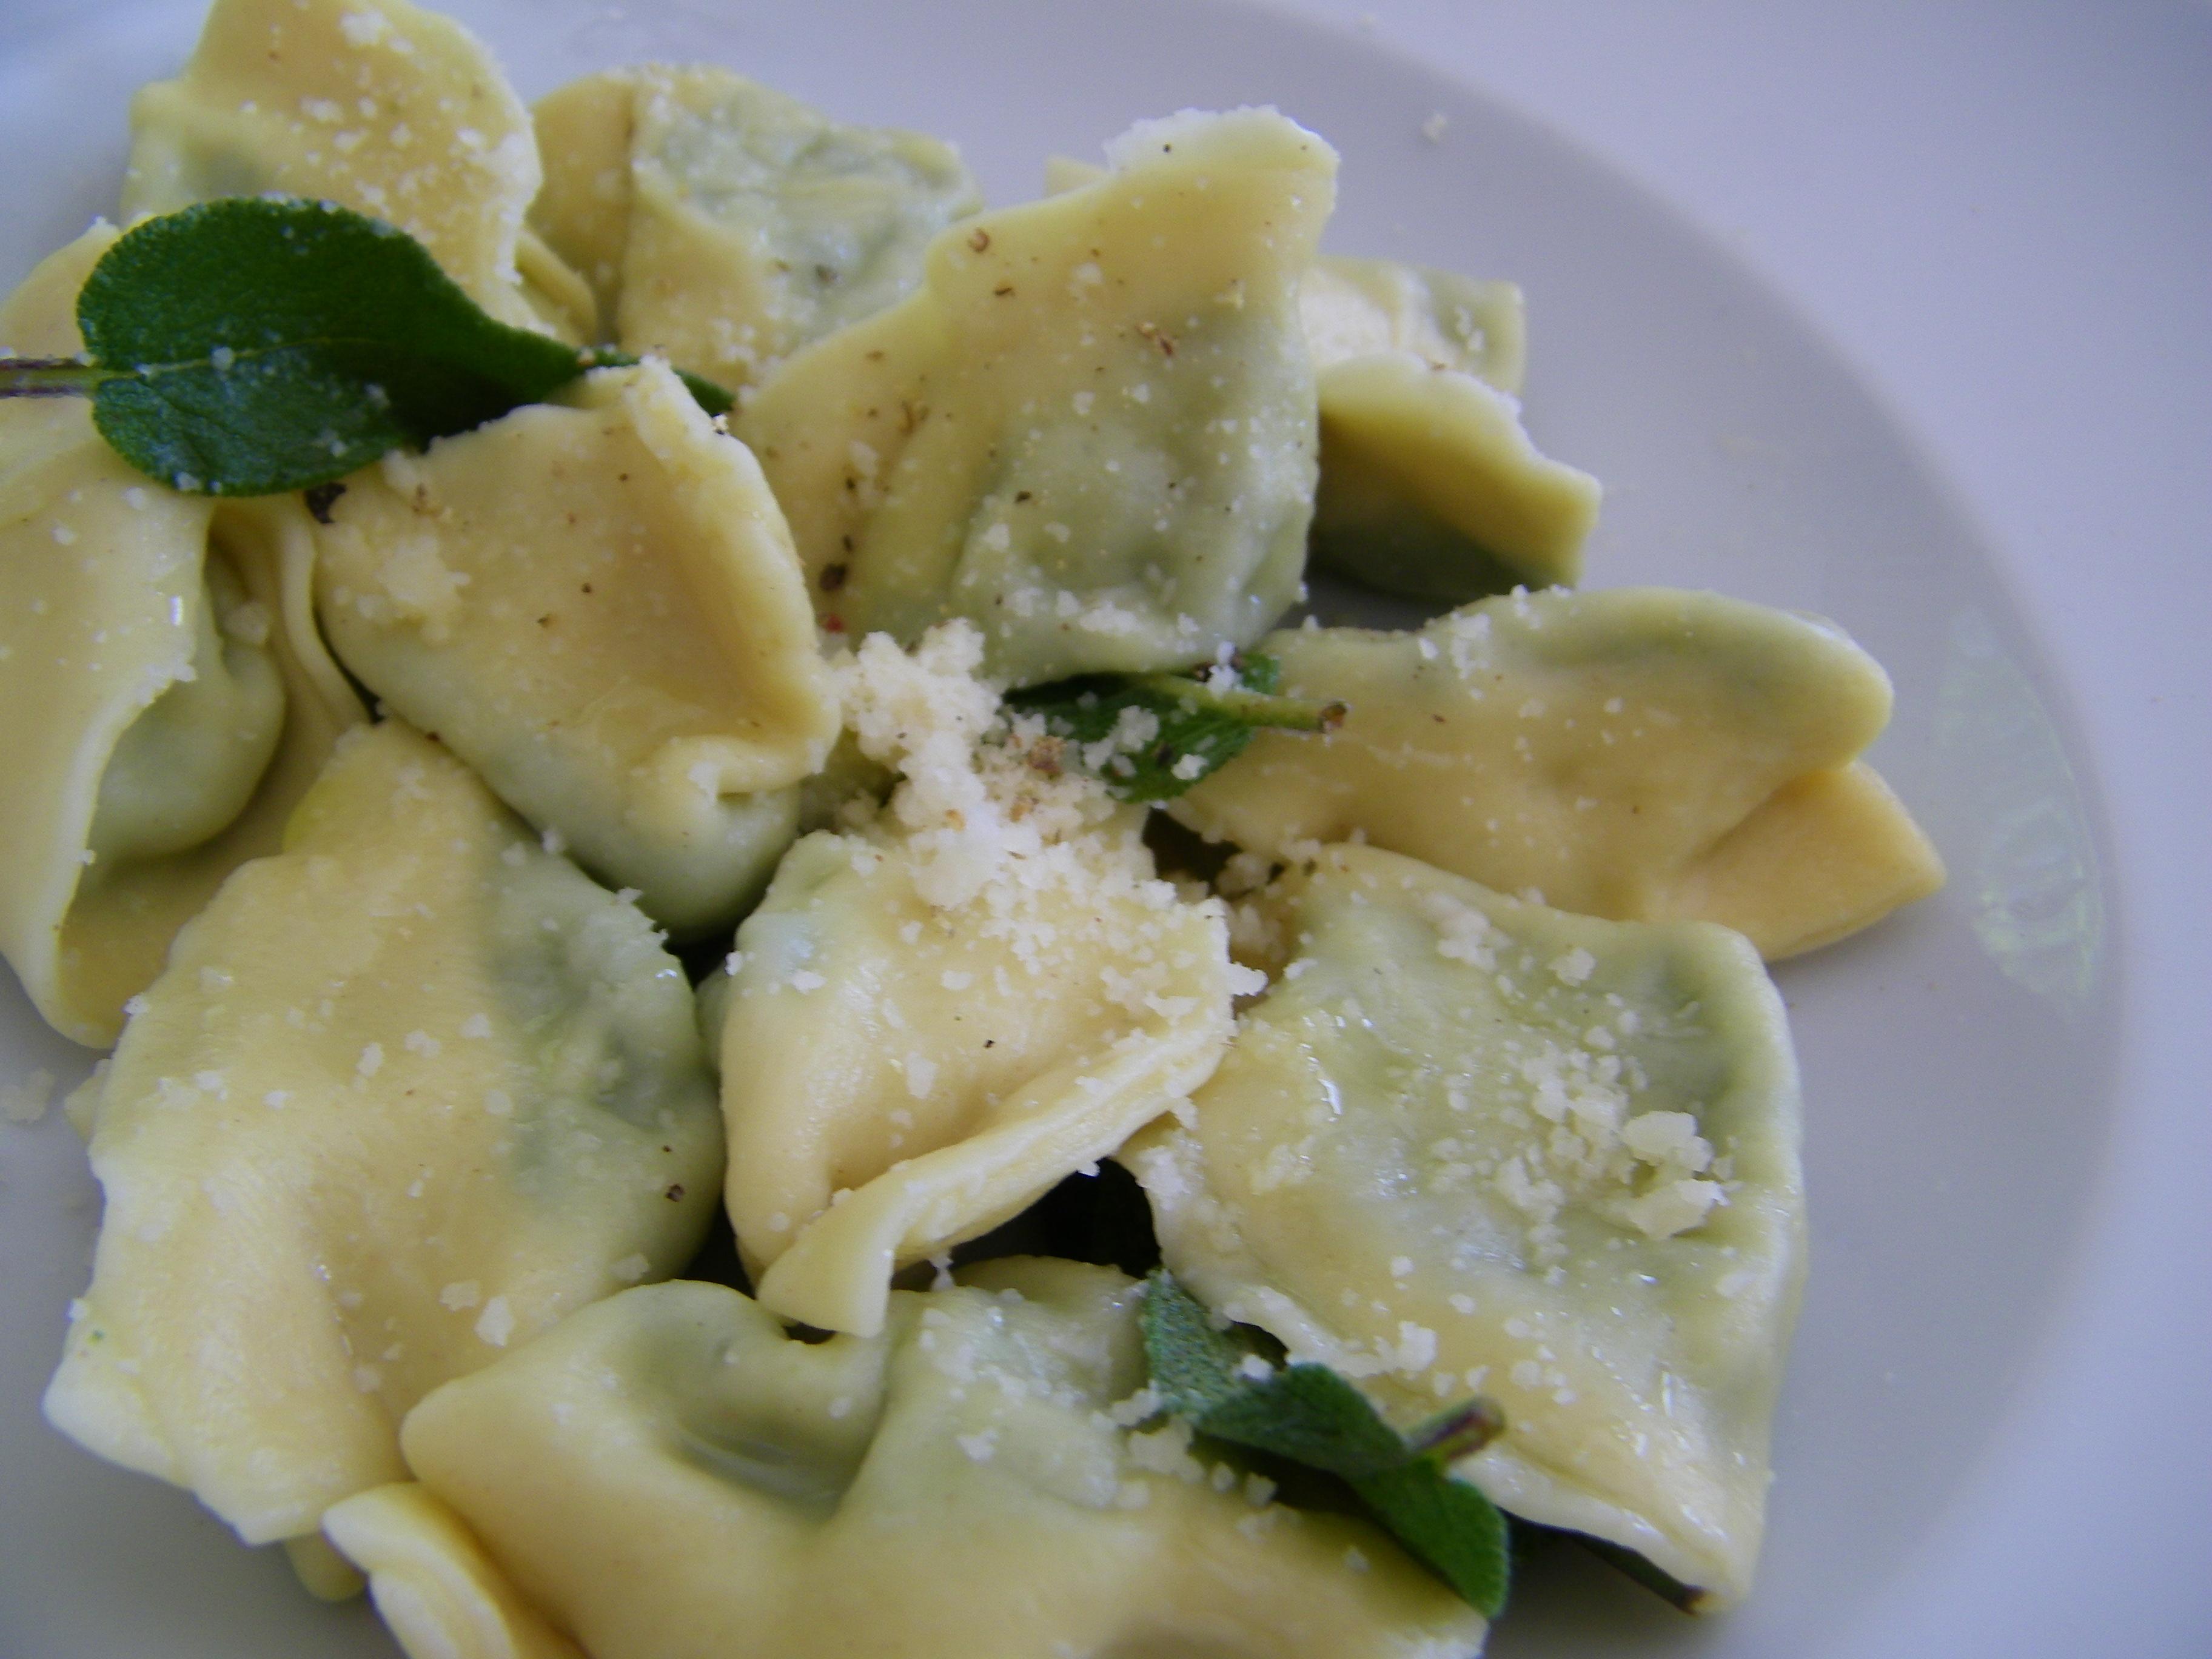 Spinach and Ricotta Tortellini catherine.drew